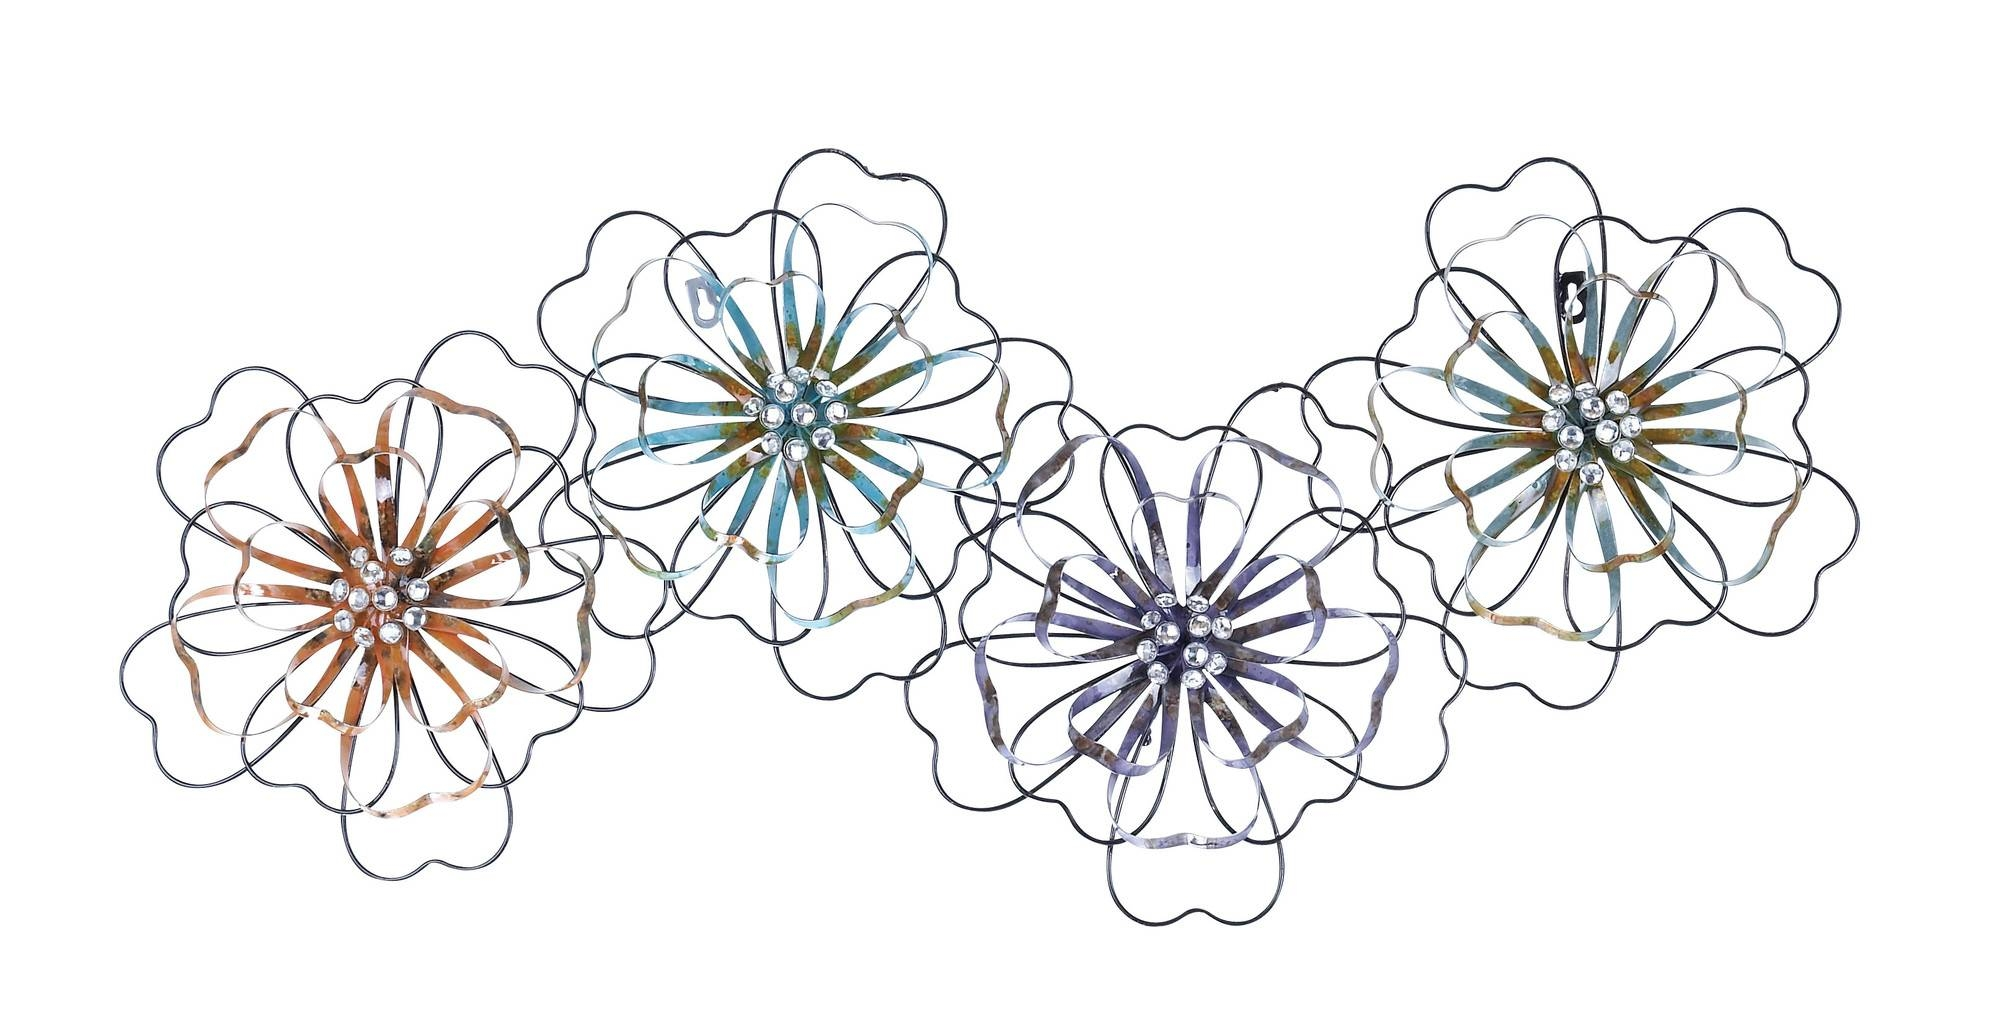 Intermingled Flowers – Floral Metal Wall Art Within Most Up To Date Metal Wall Art Flowers (View 7 of 20)